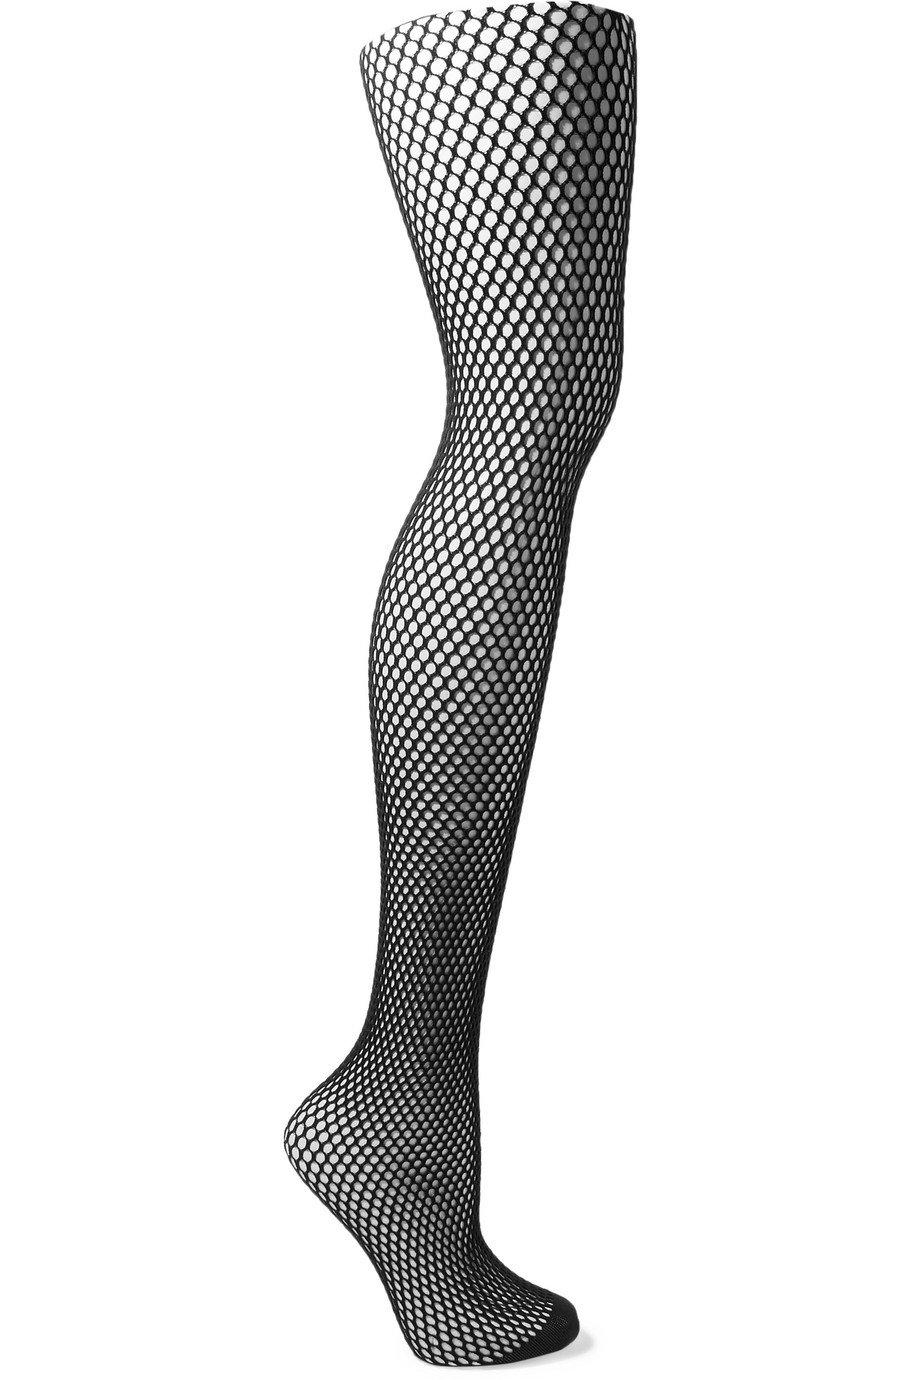 Falke | Fishnet tights | NET-A-PORTER.COM